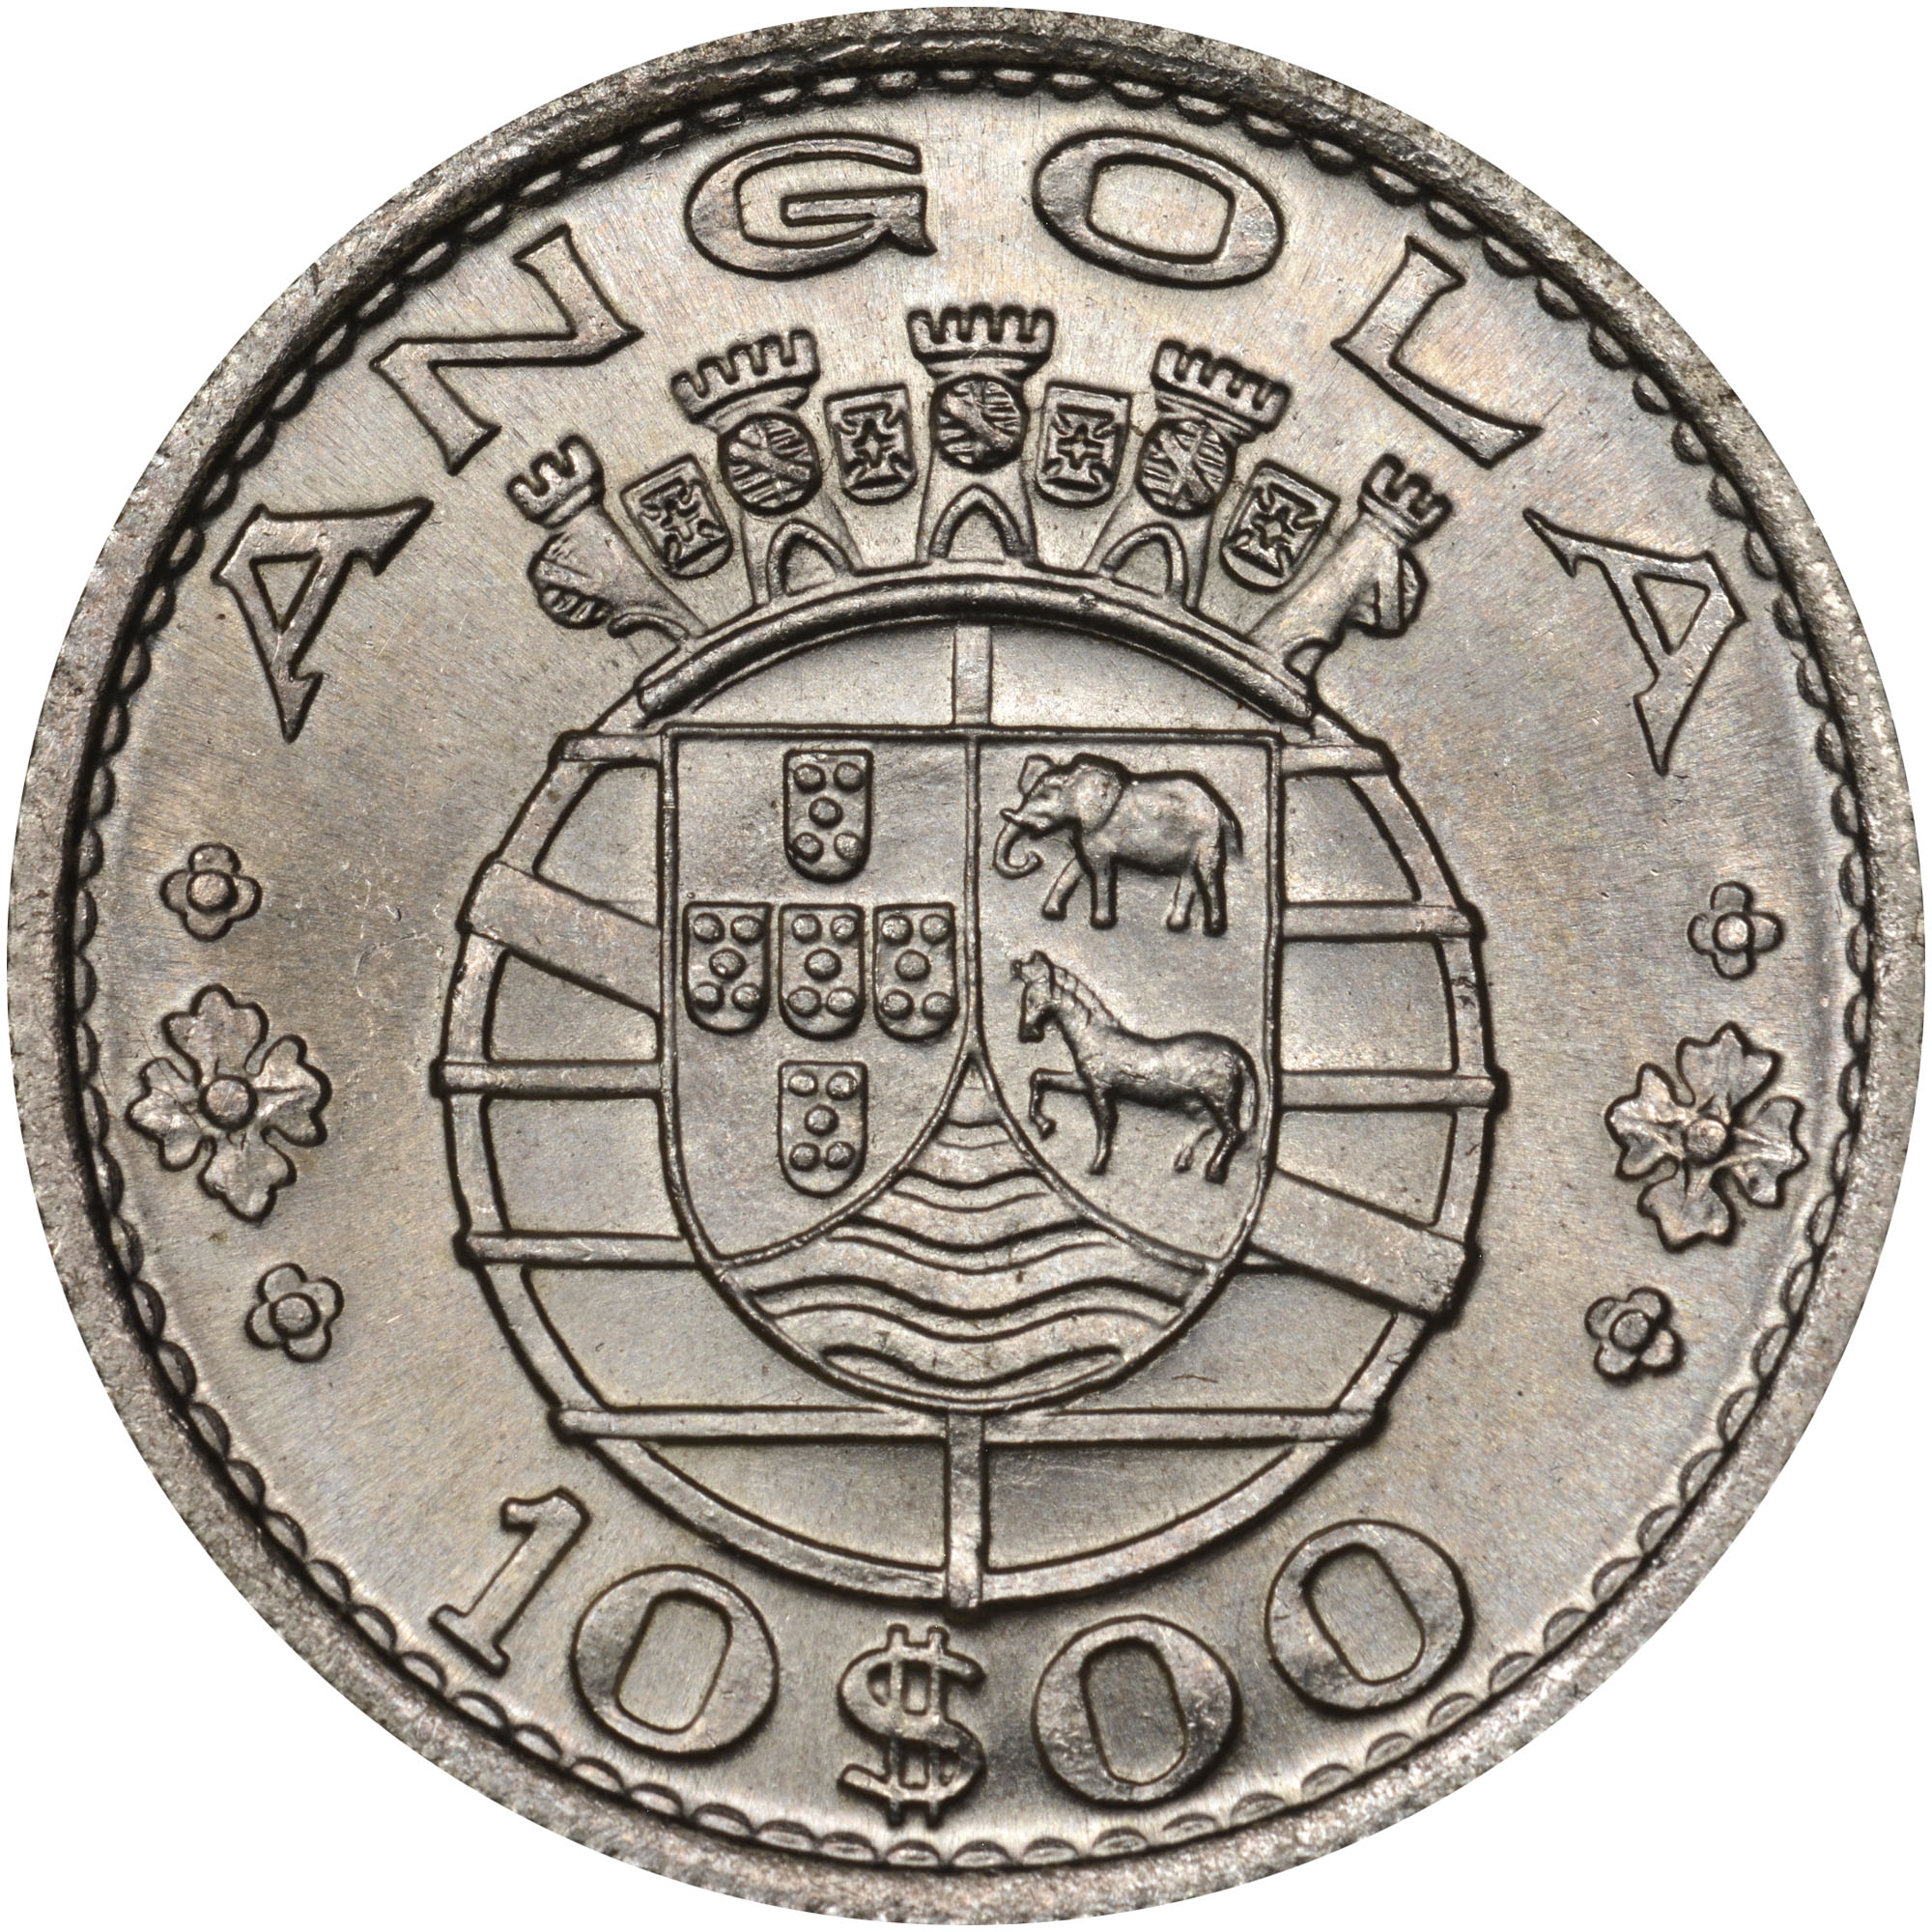 1955 Angola 10 Escudos reverse